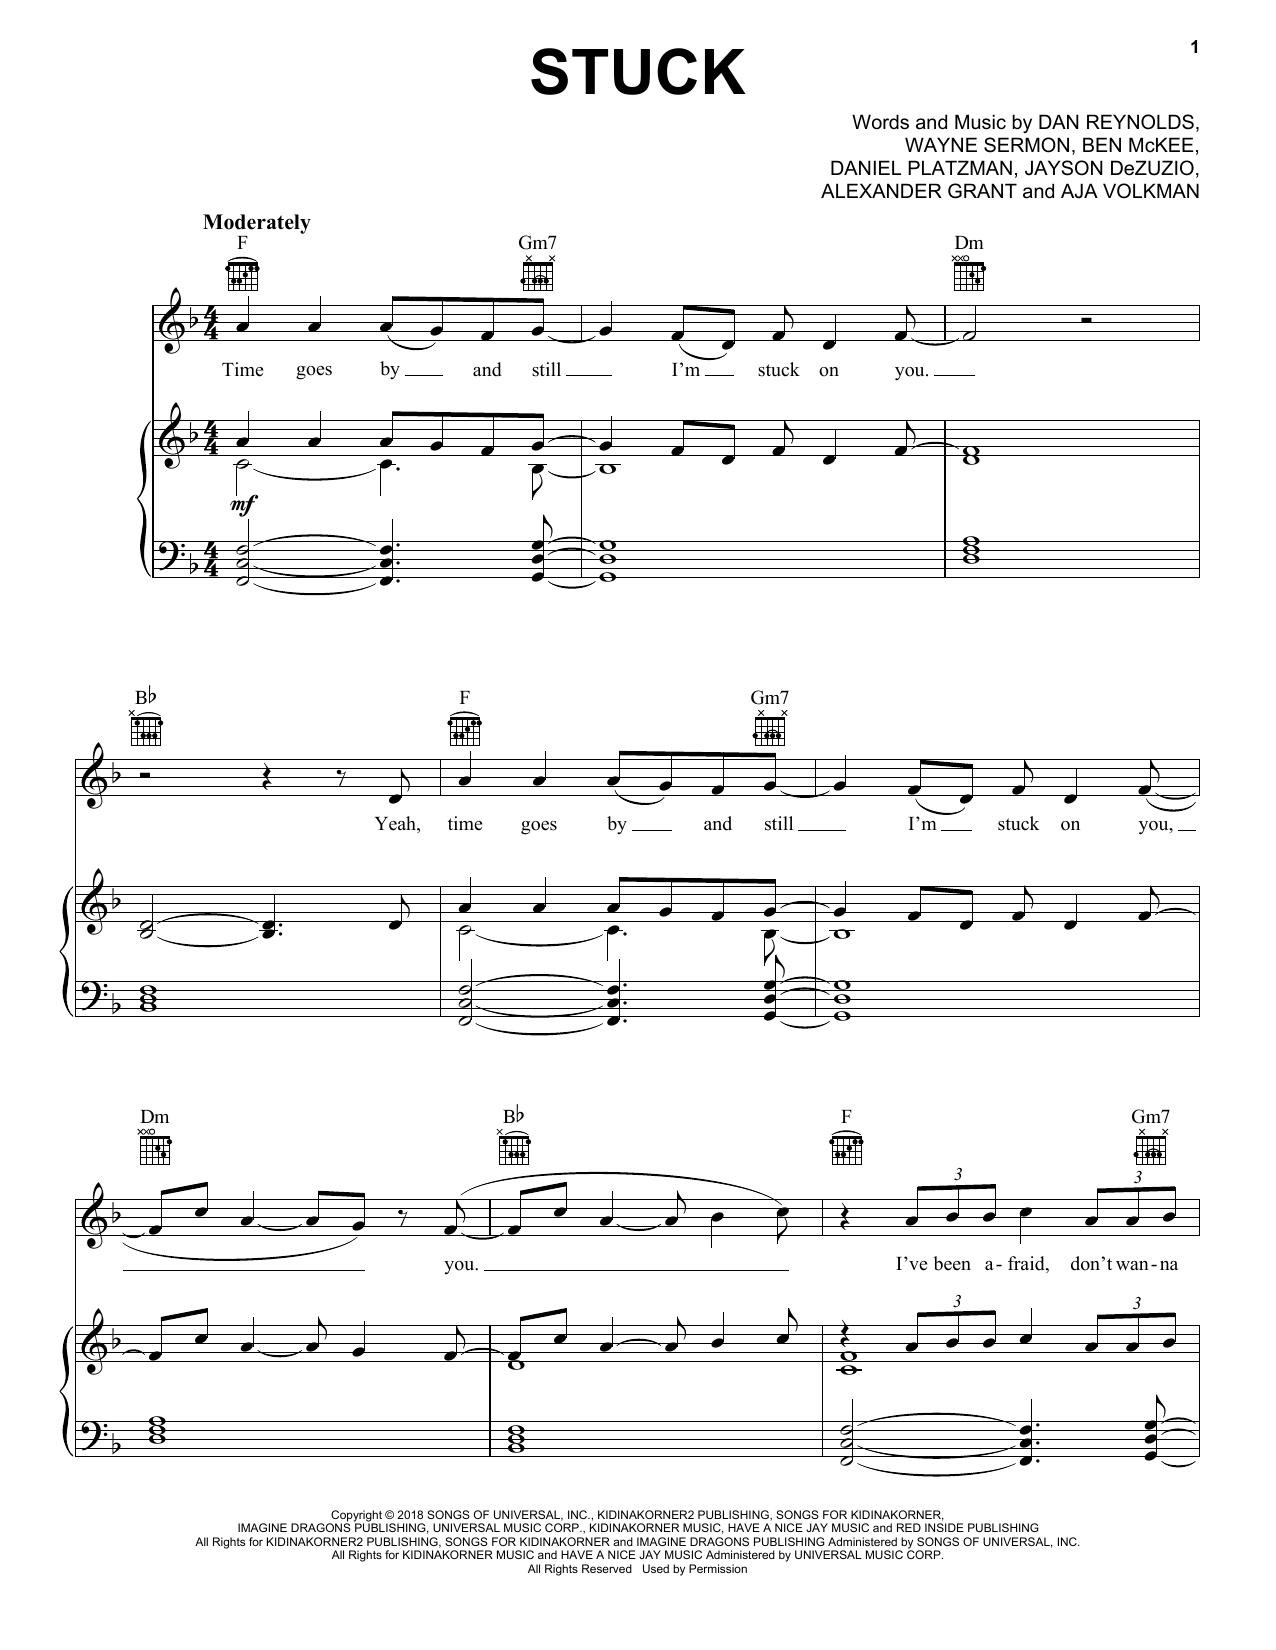 Imagine Dragons Stuck sheet music notes and chords. Download Printable PDF.